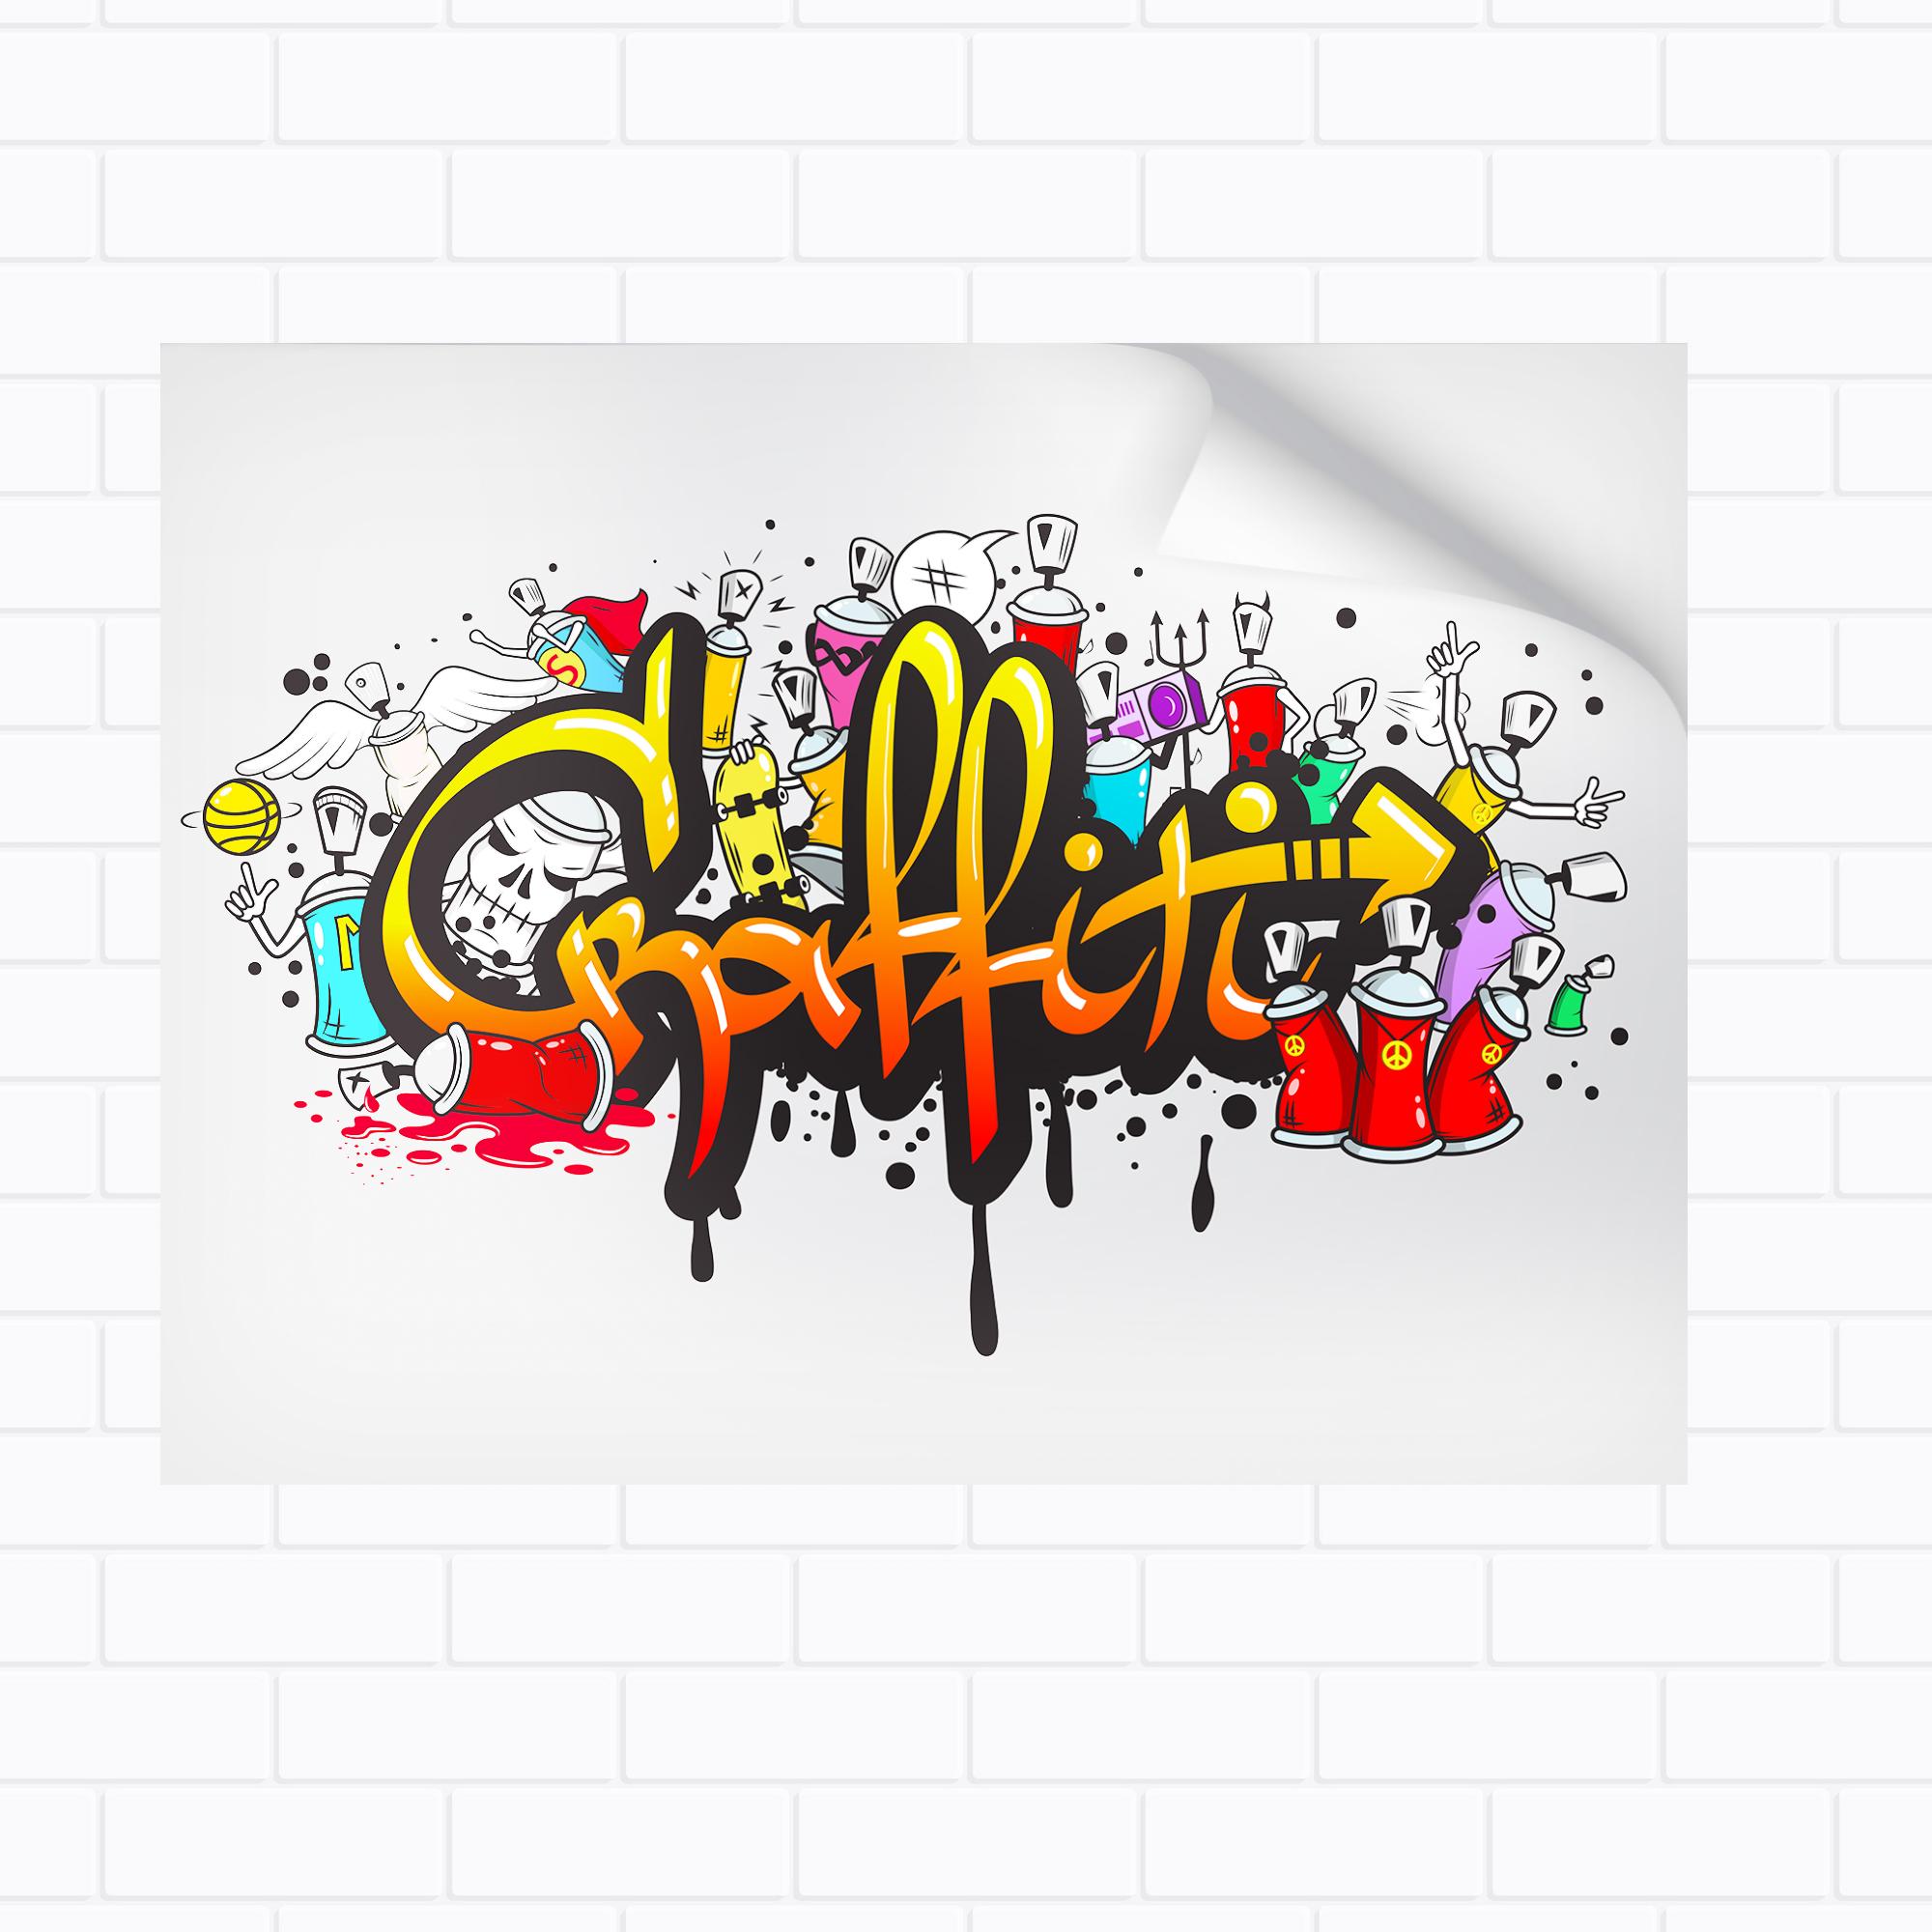 Wall Mural / Hoarding Sticker